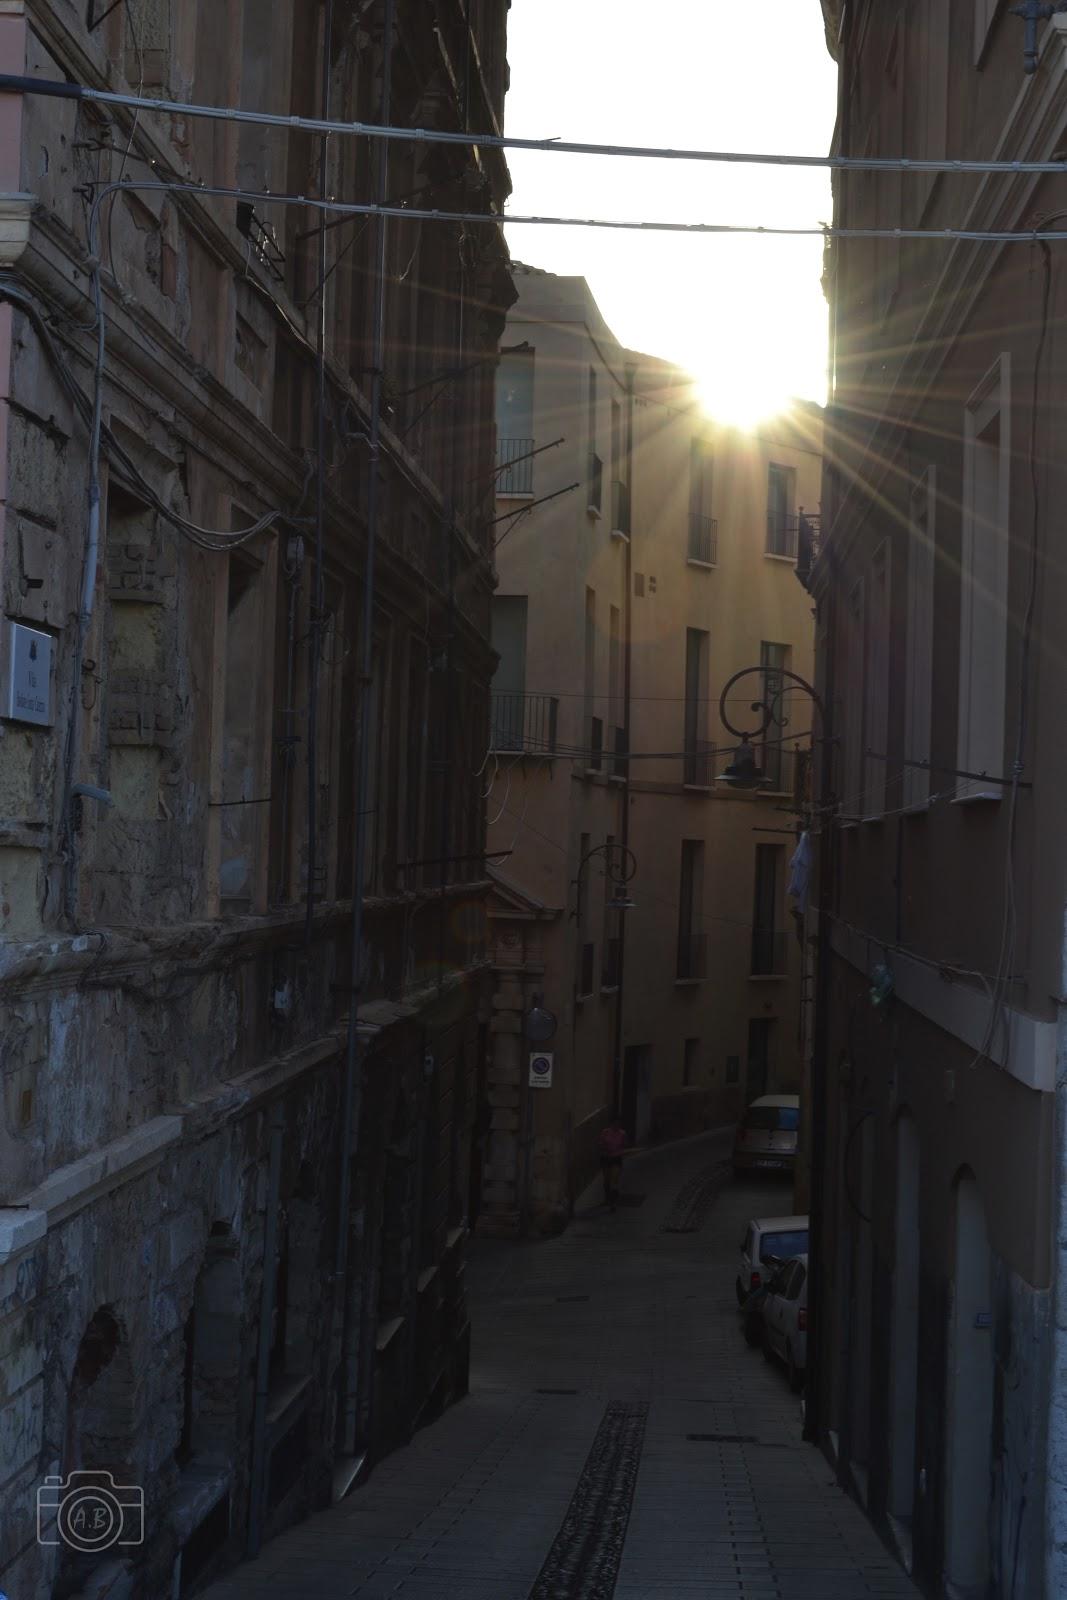 Cagliari, Sardegna, Sardaigne, soleil, rue , strada